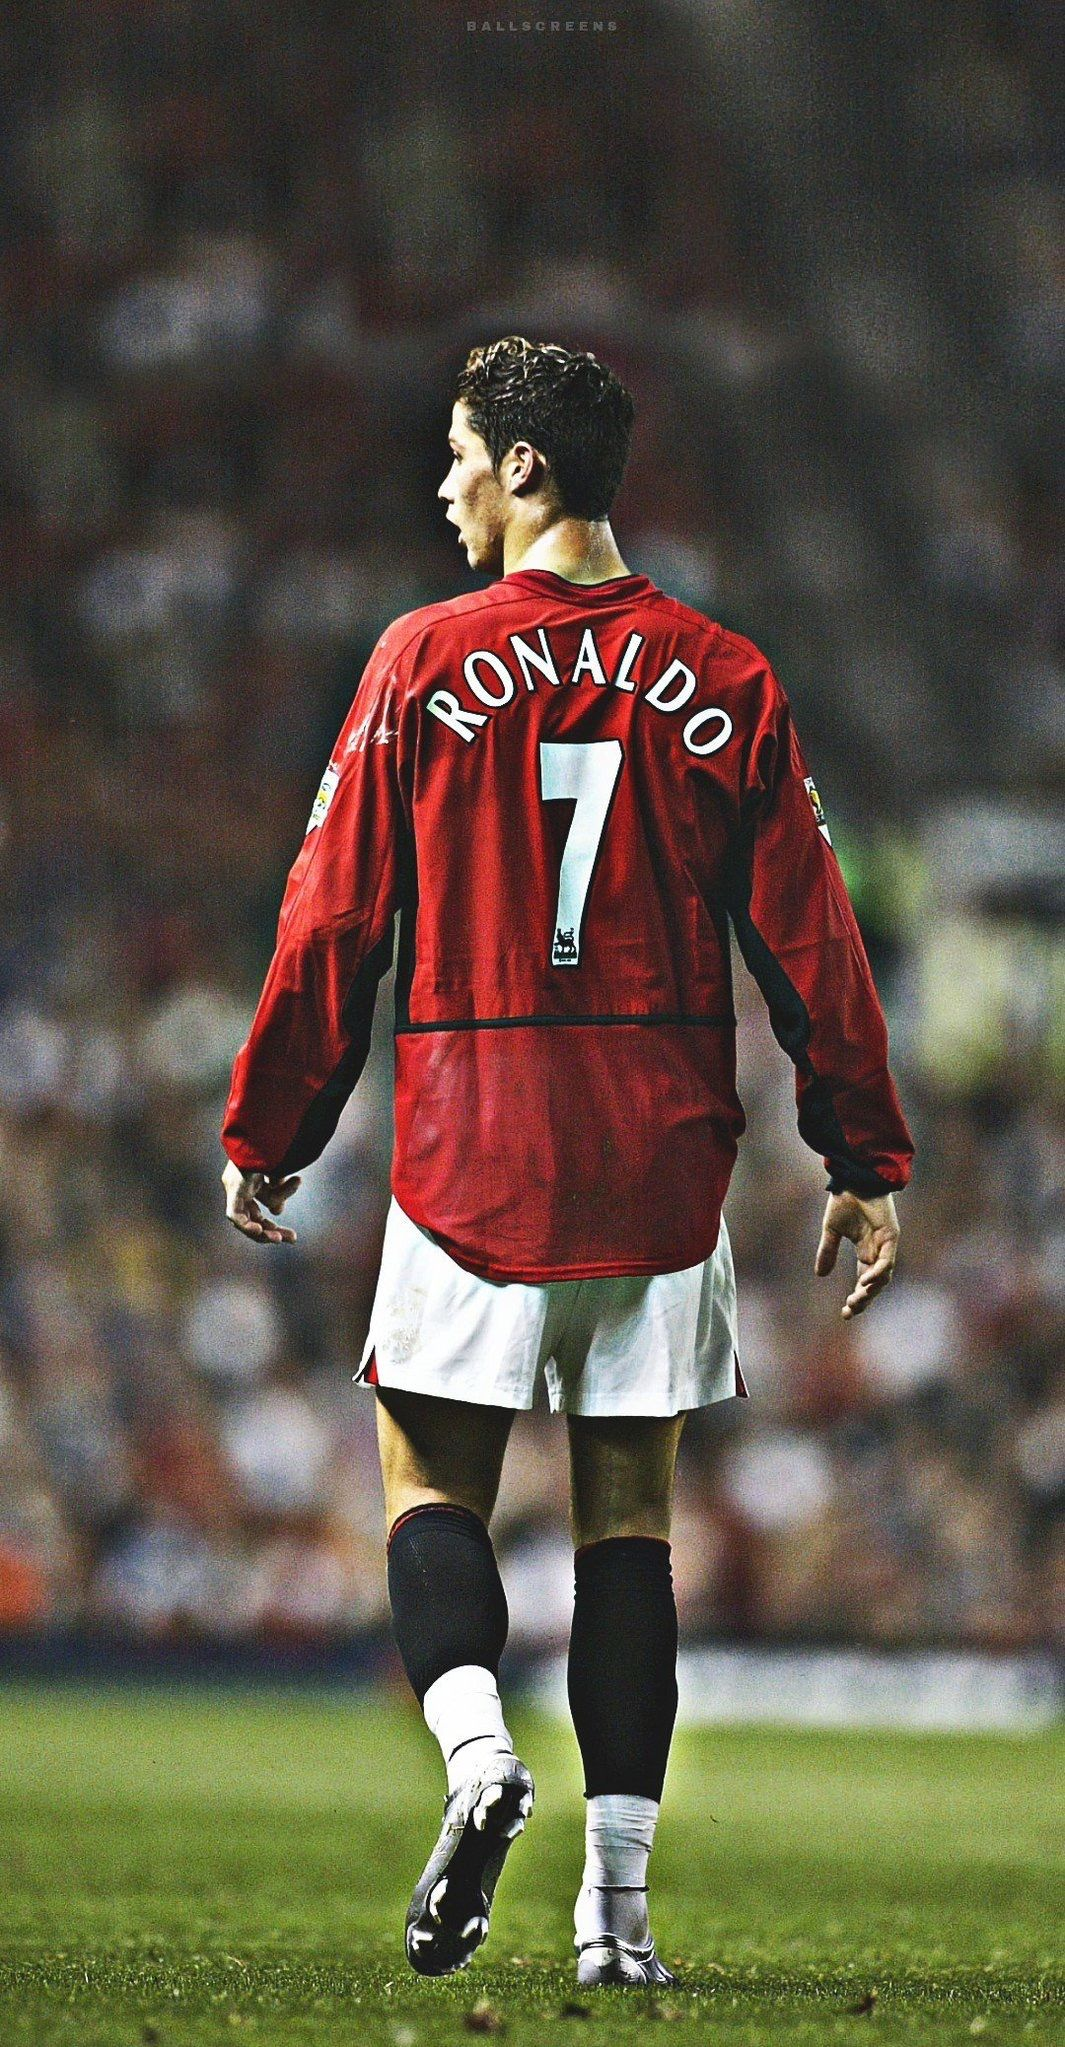 Pin By Bertl On Manchester United Cristiano Ronaldo Manchester